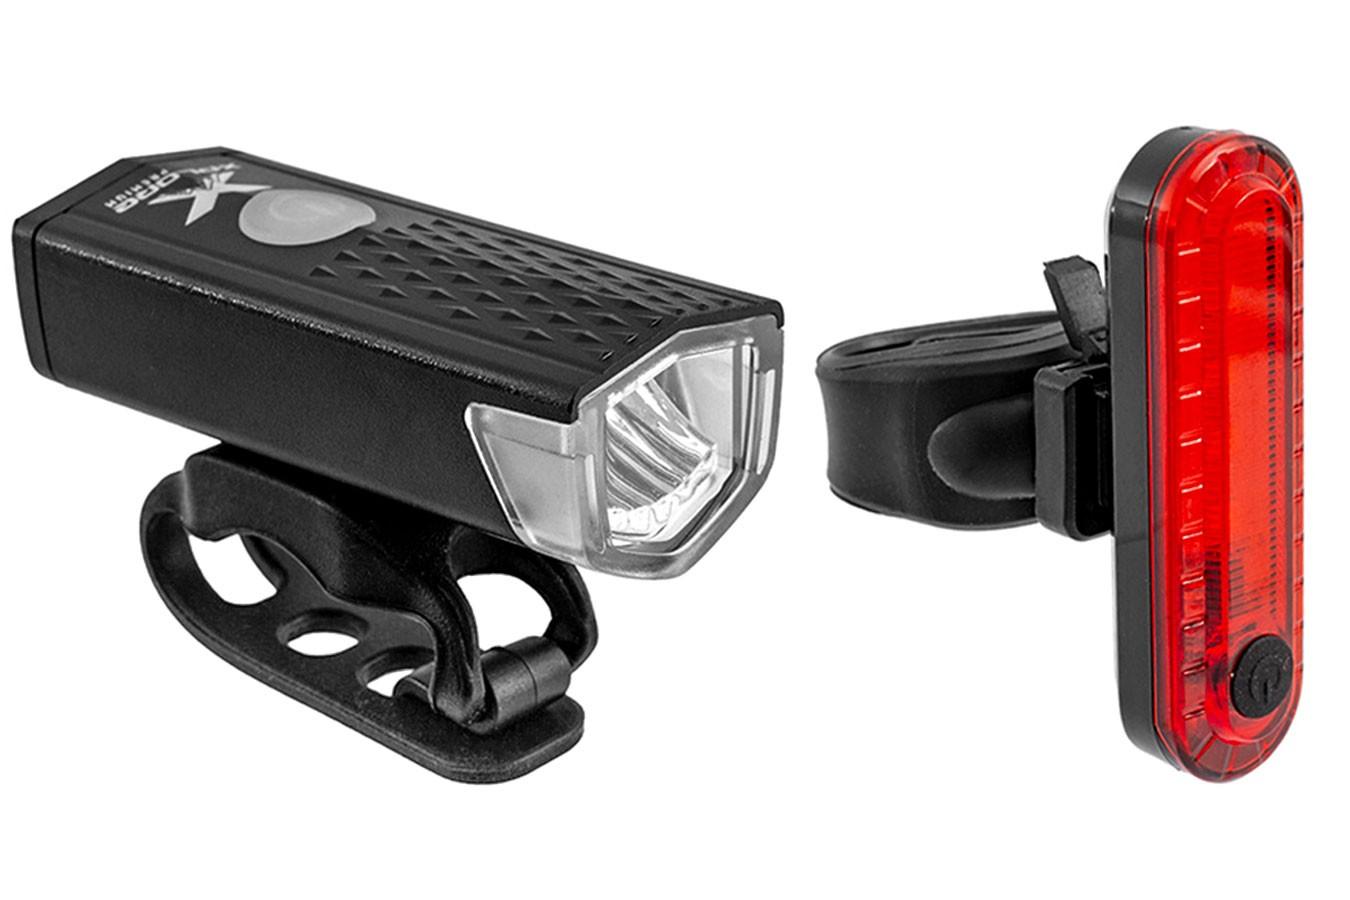 Kit farol recarregável USB 120/10 lúmens - X-plore